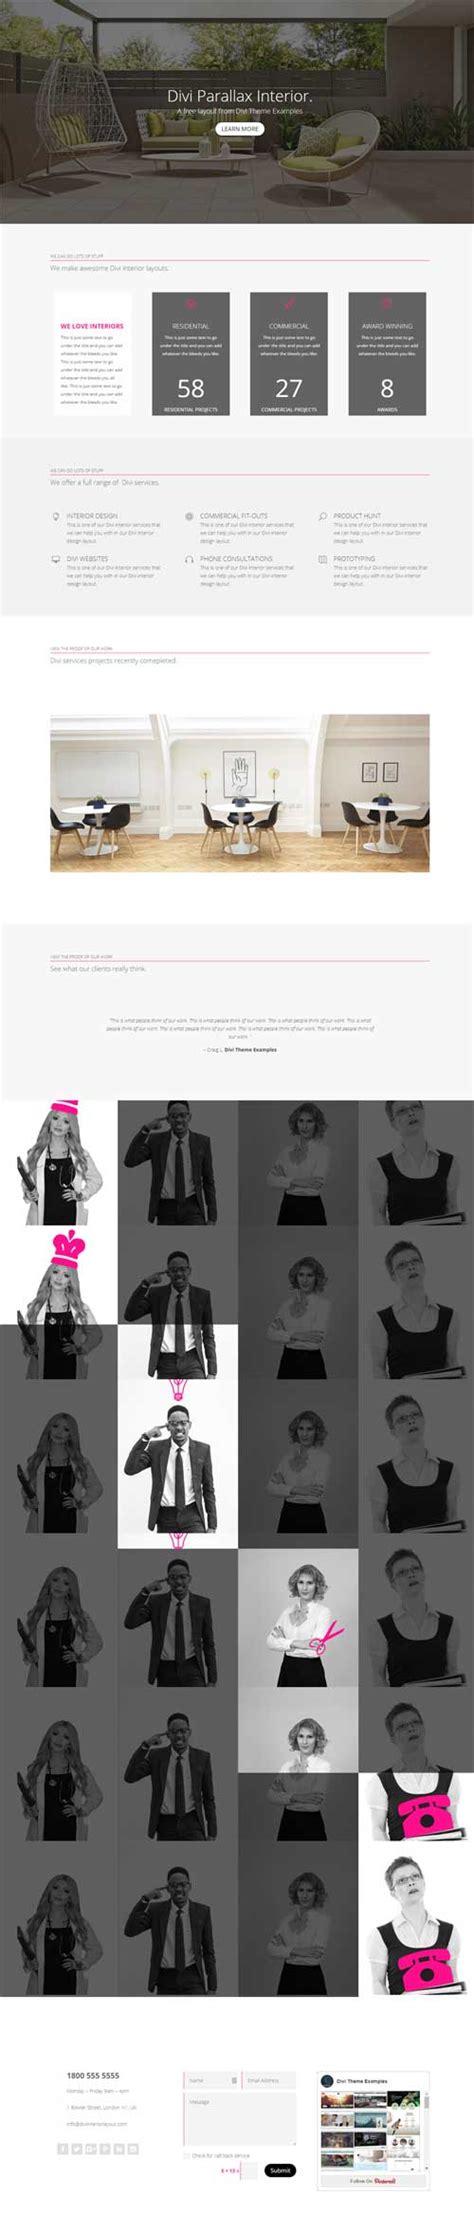 interior design agency interior design agency 1 page layout divi theme layouts